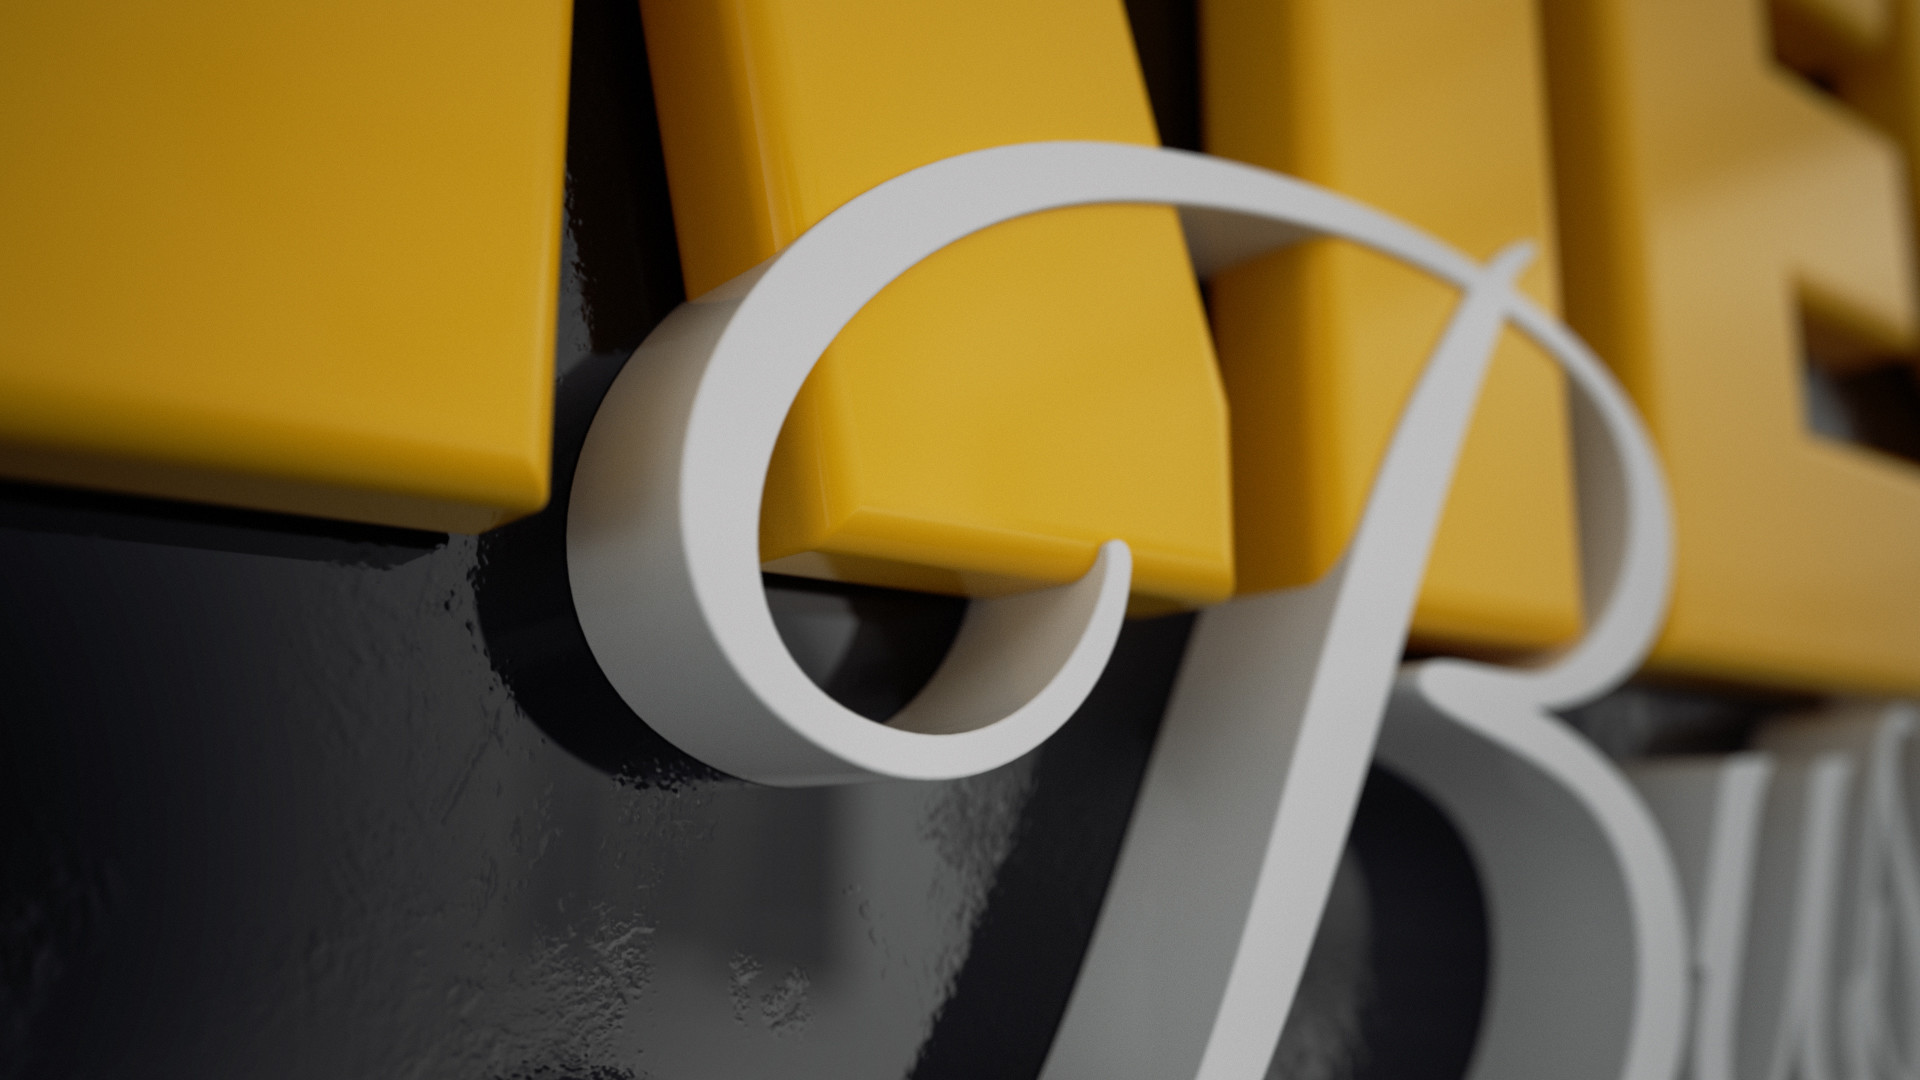 Reinhard kepplinger kiesl logo v4 arion test sl 11 19 min aa2 pixrad 08 gi8 yellow kiesl carpaint cam2 new back16k no more banding